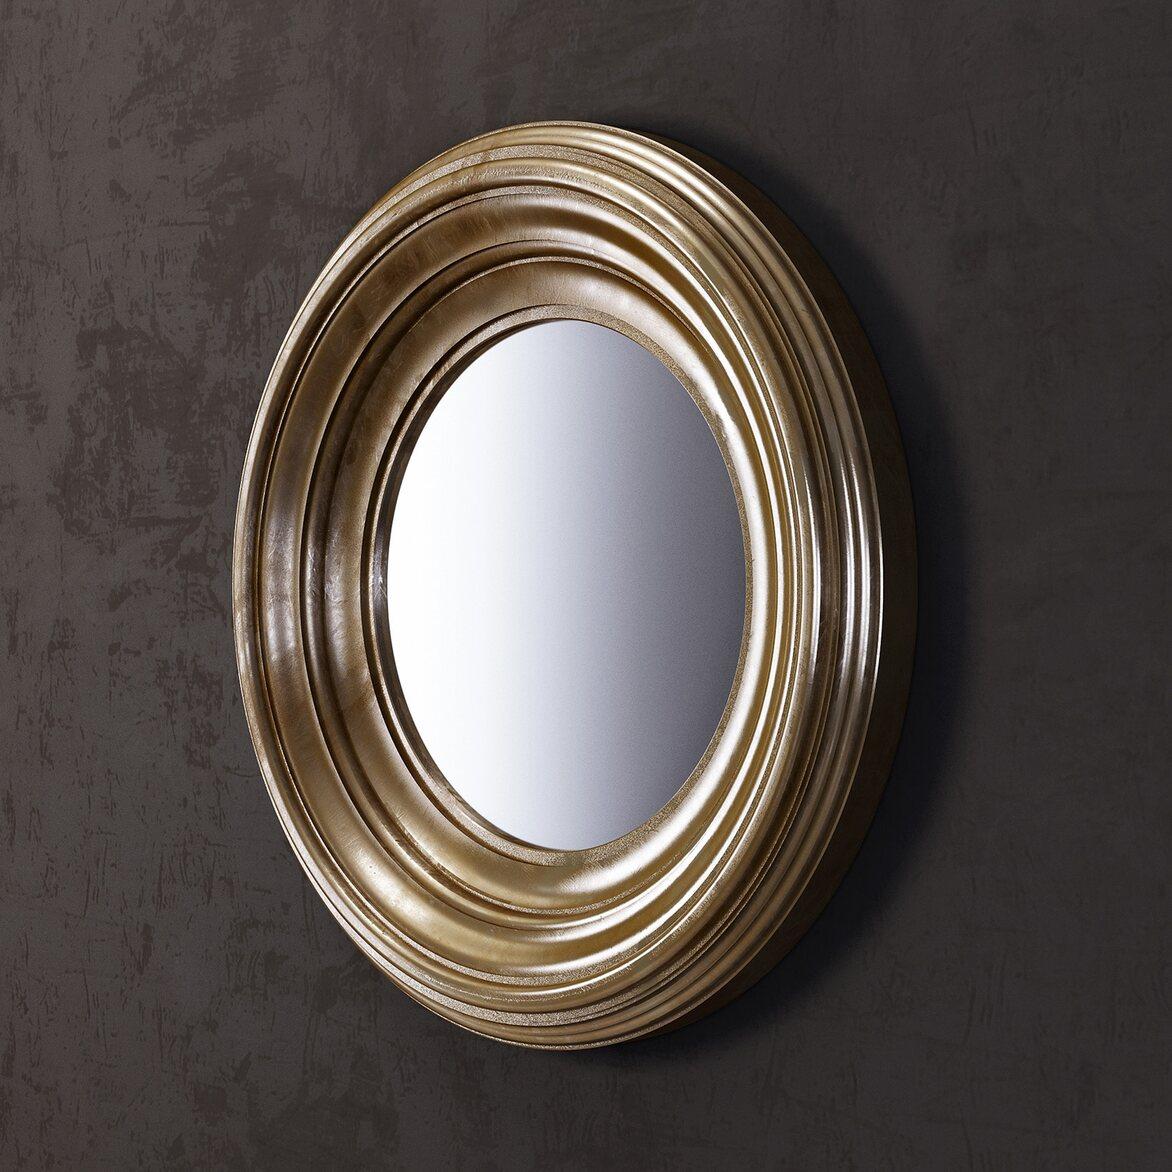 Зеркало Coventry, золотое 2 | Настенные зеркала Kingsby